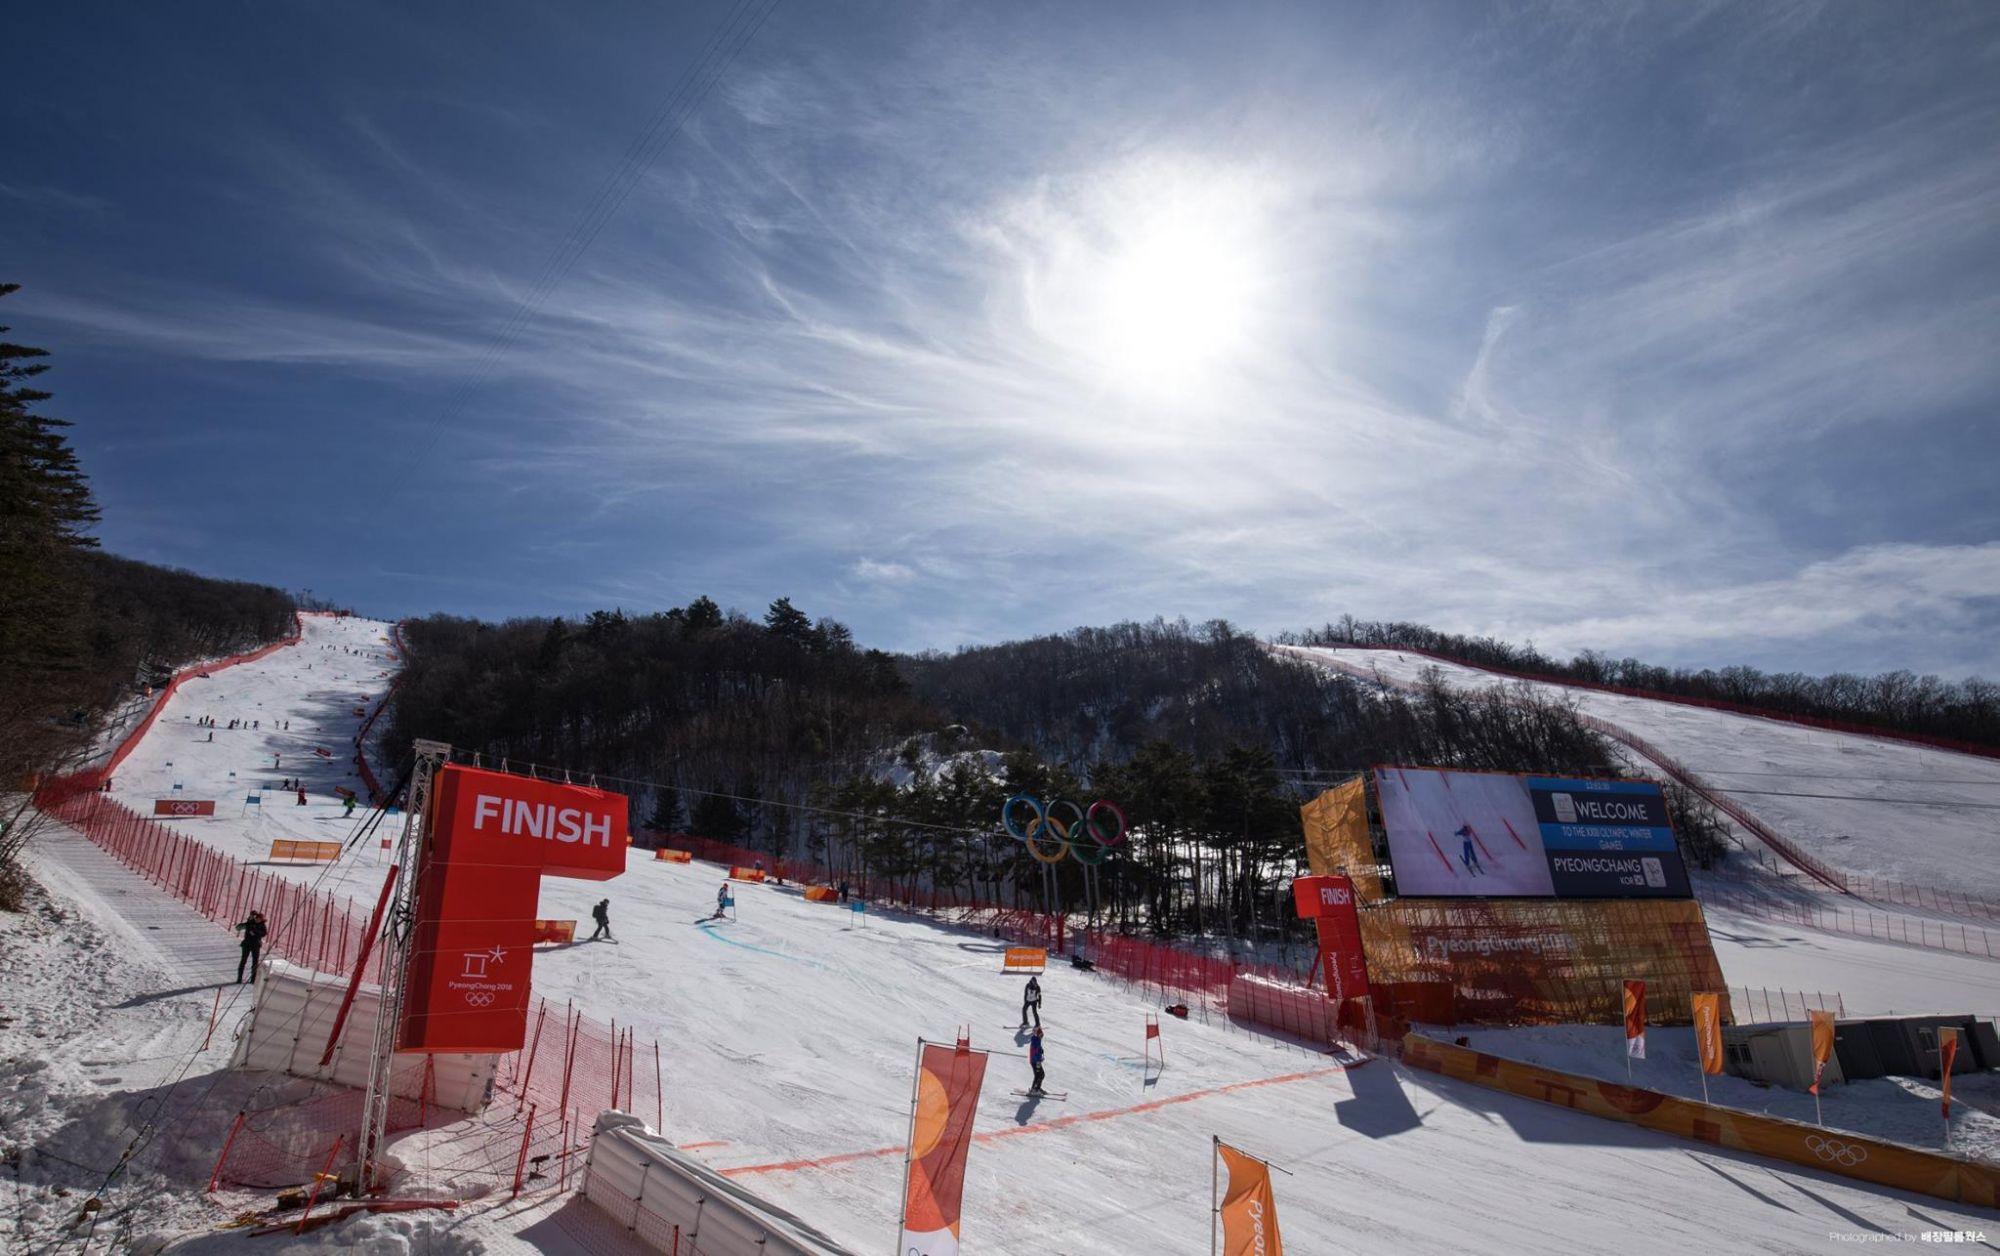 Galaxy - water park (Krasnaya Polyana): water entertainment in the ski resort